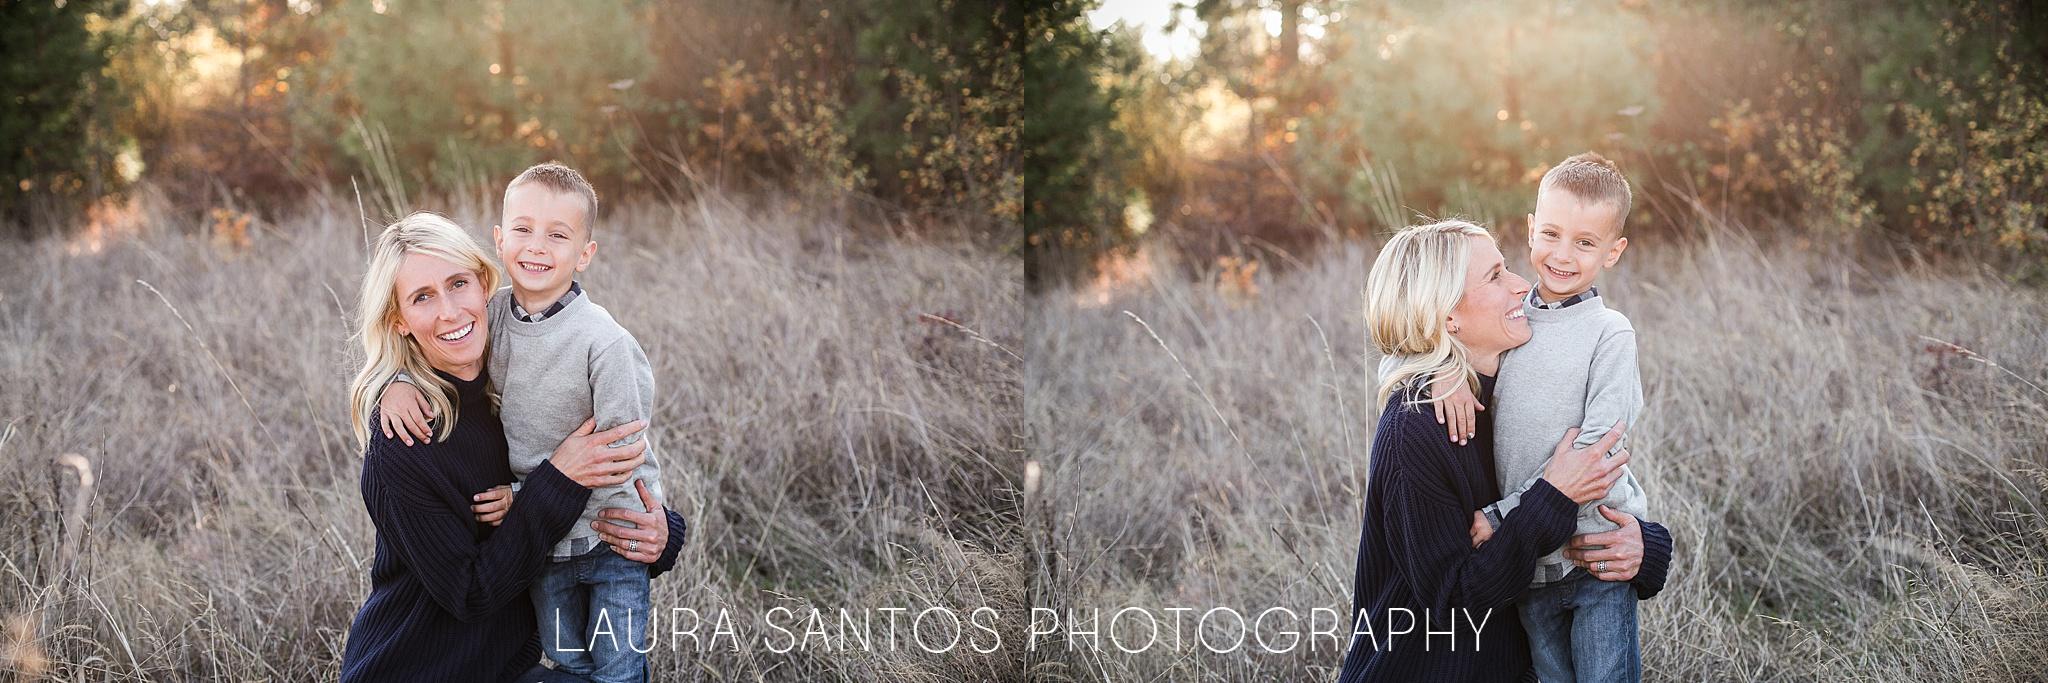 Laura Santos Photography Portland Oregon Family Photographer_0813.jpg